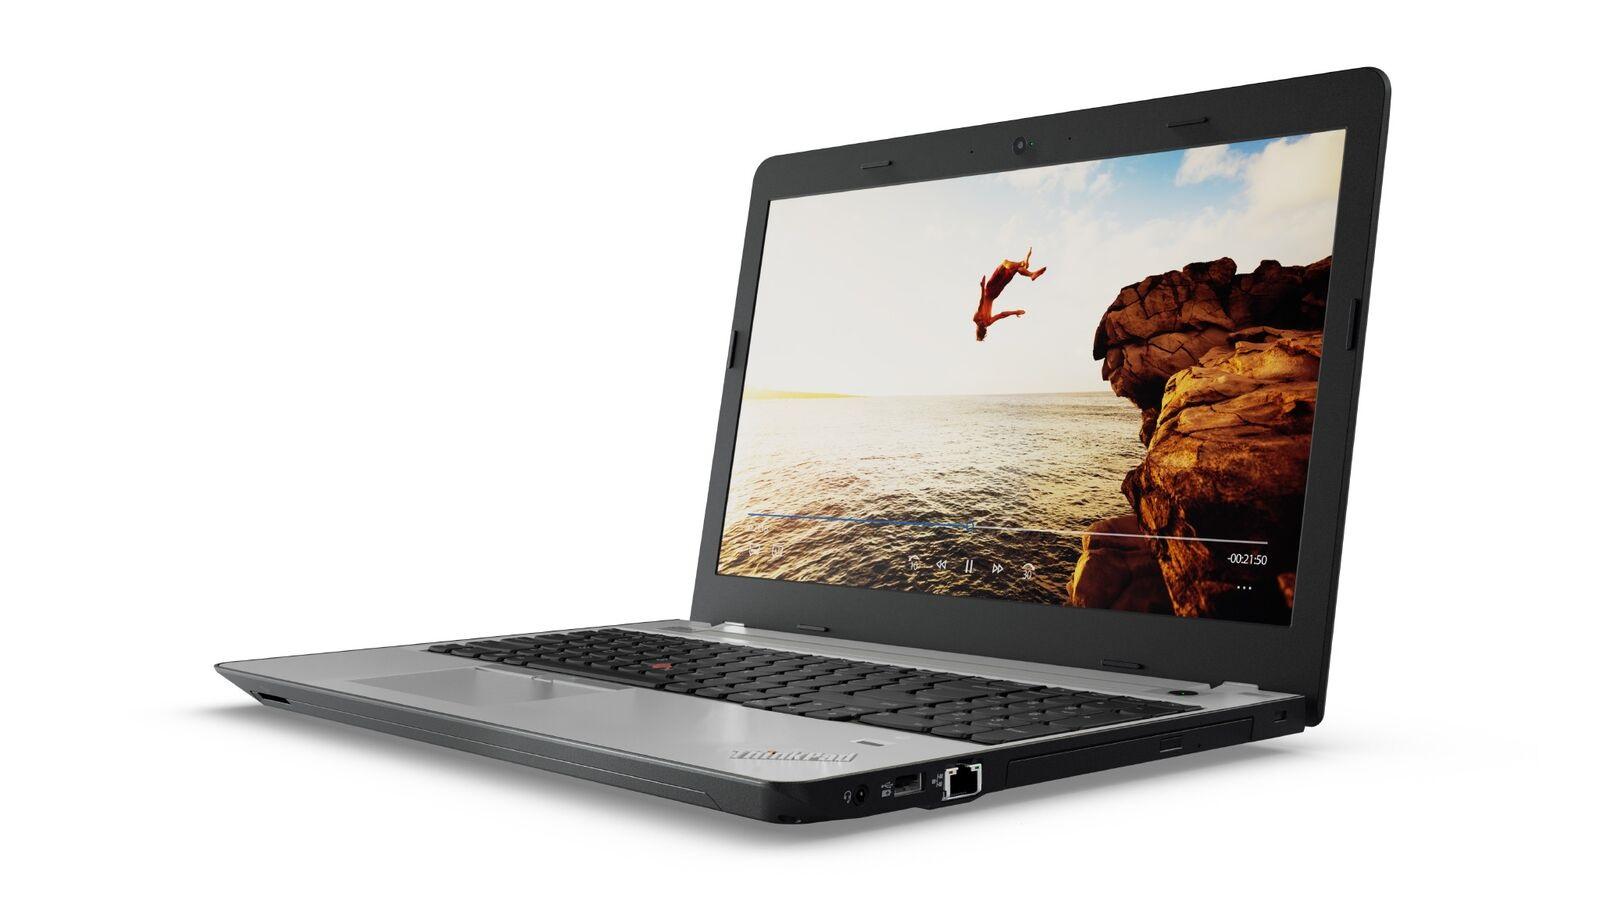 "Lenovo ThinkPad E570 i5-7200U/8GB/256GB SSD/DVD±RW/HD Graphic 620/15,6""FHD matný/Win10PRO černo-stříbrný"